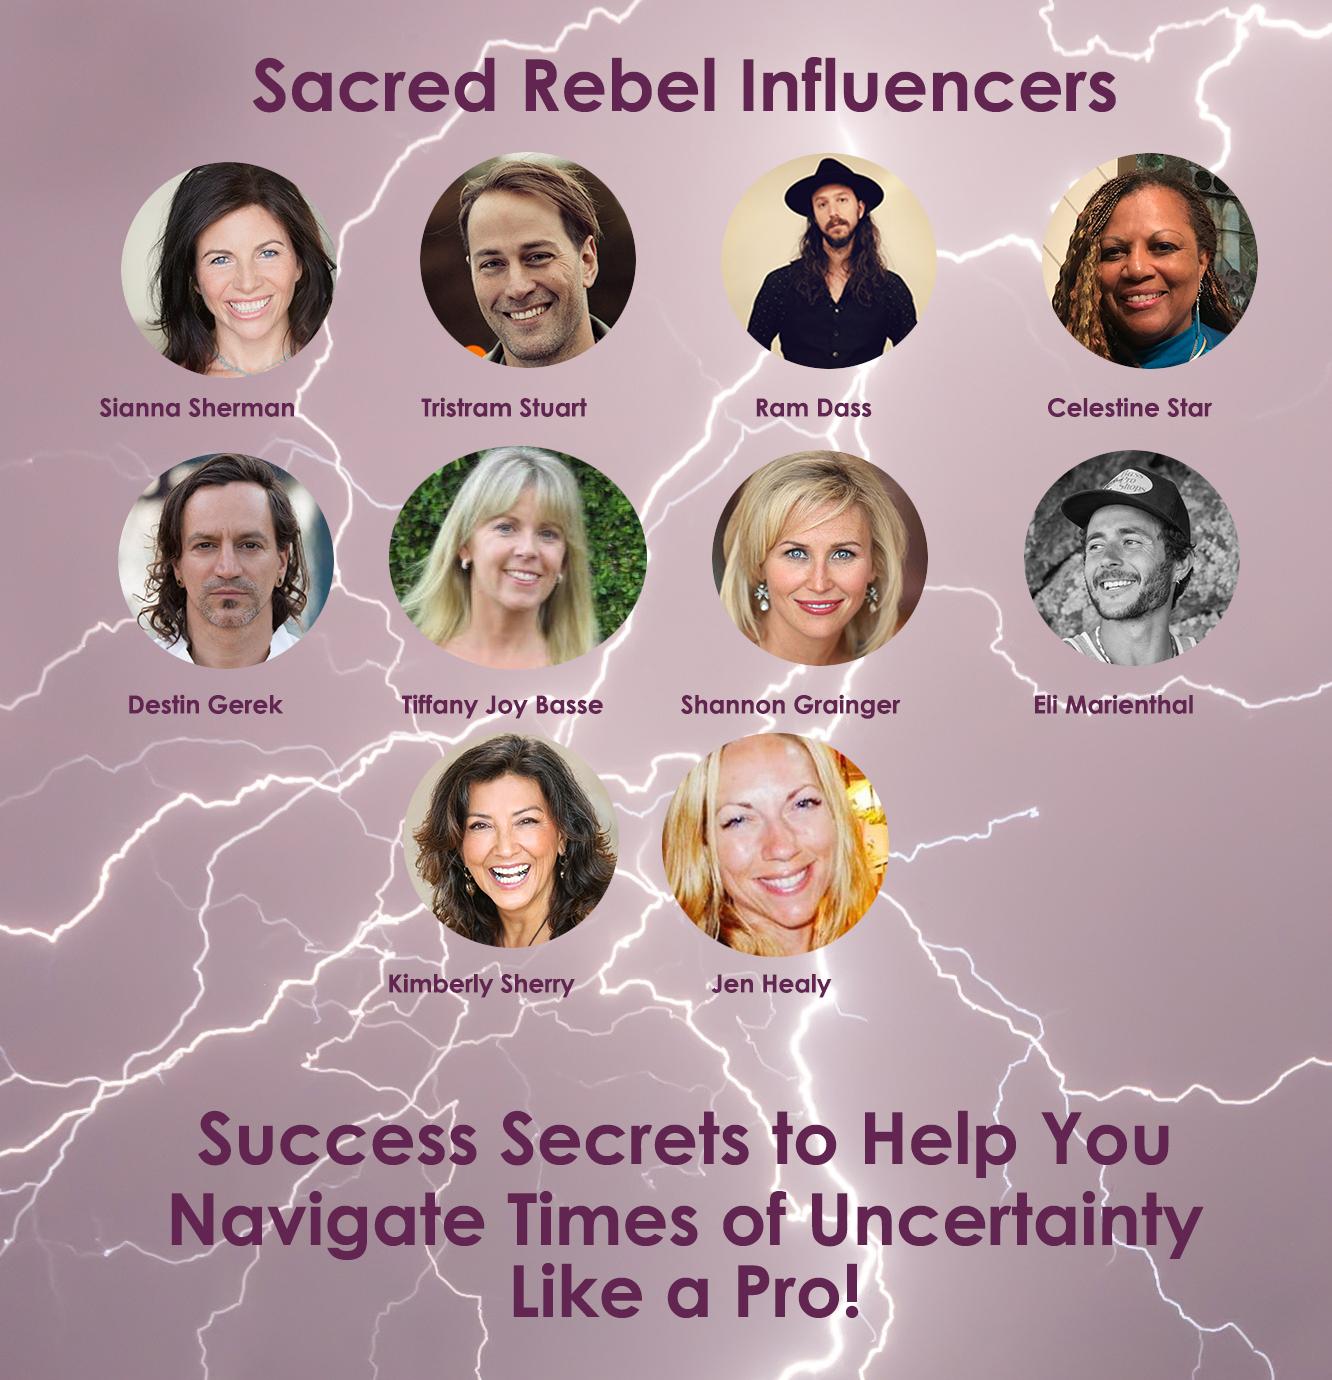 Sacred Rebel Influencers top 10